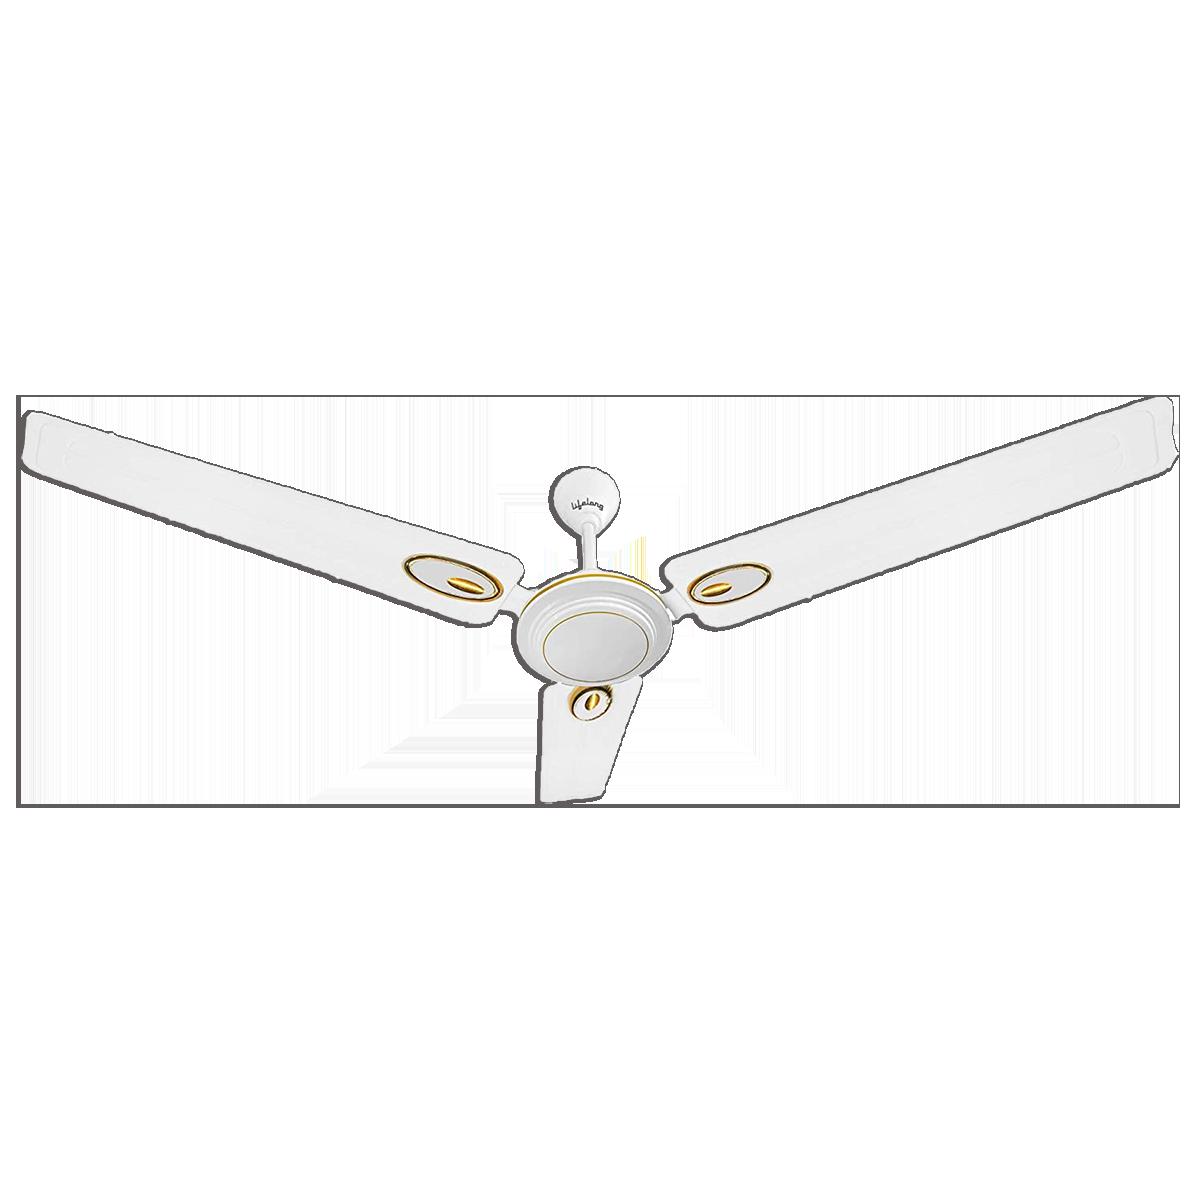 Lifelong 120cm Sweep 3 Blades Ceiling Fan (Efficient Copper Motor, LLCF301, White)_1